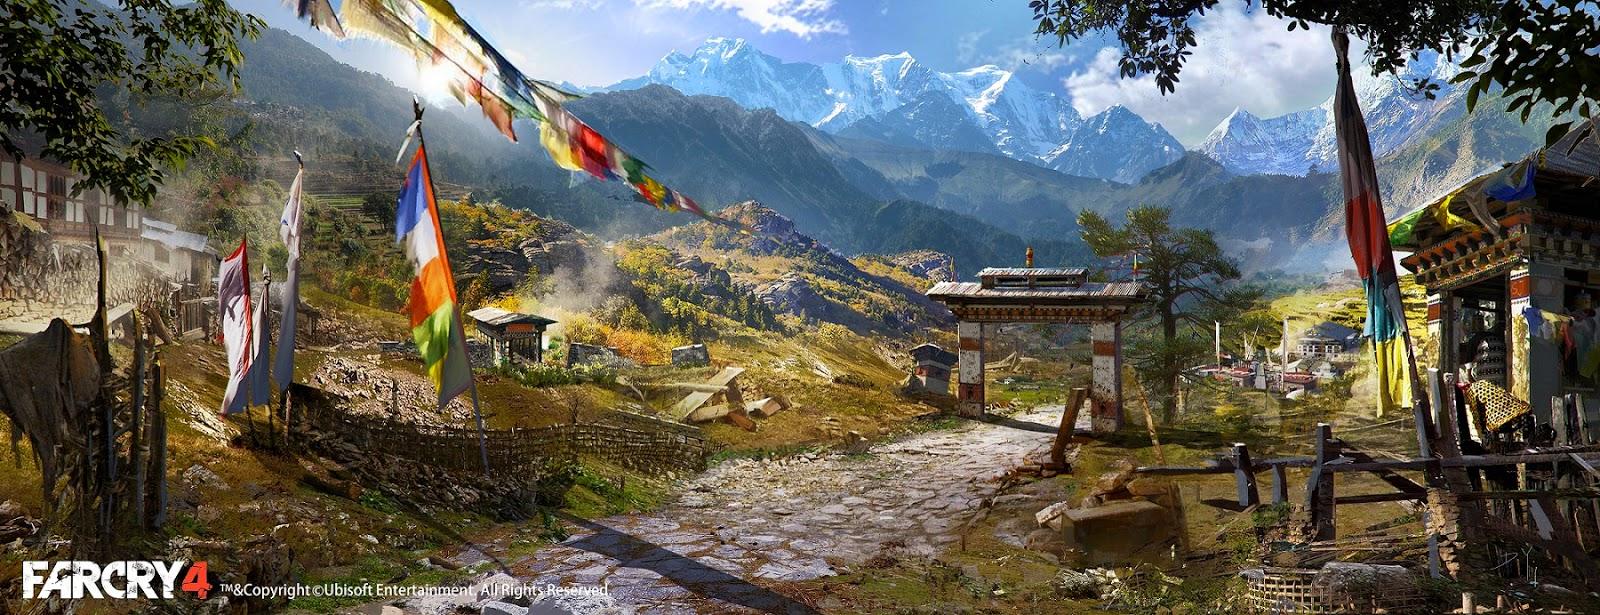 Far cry 4 matchmaking dzig